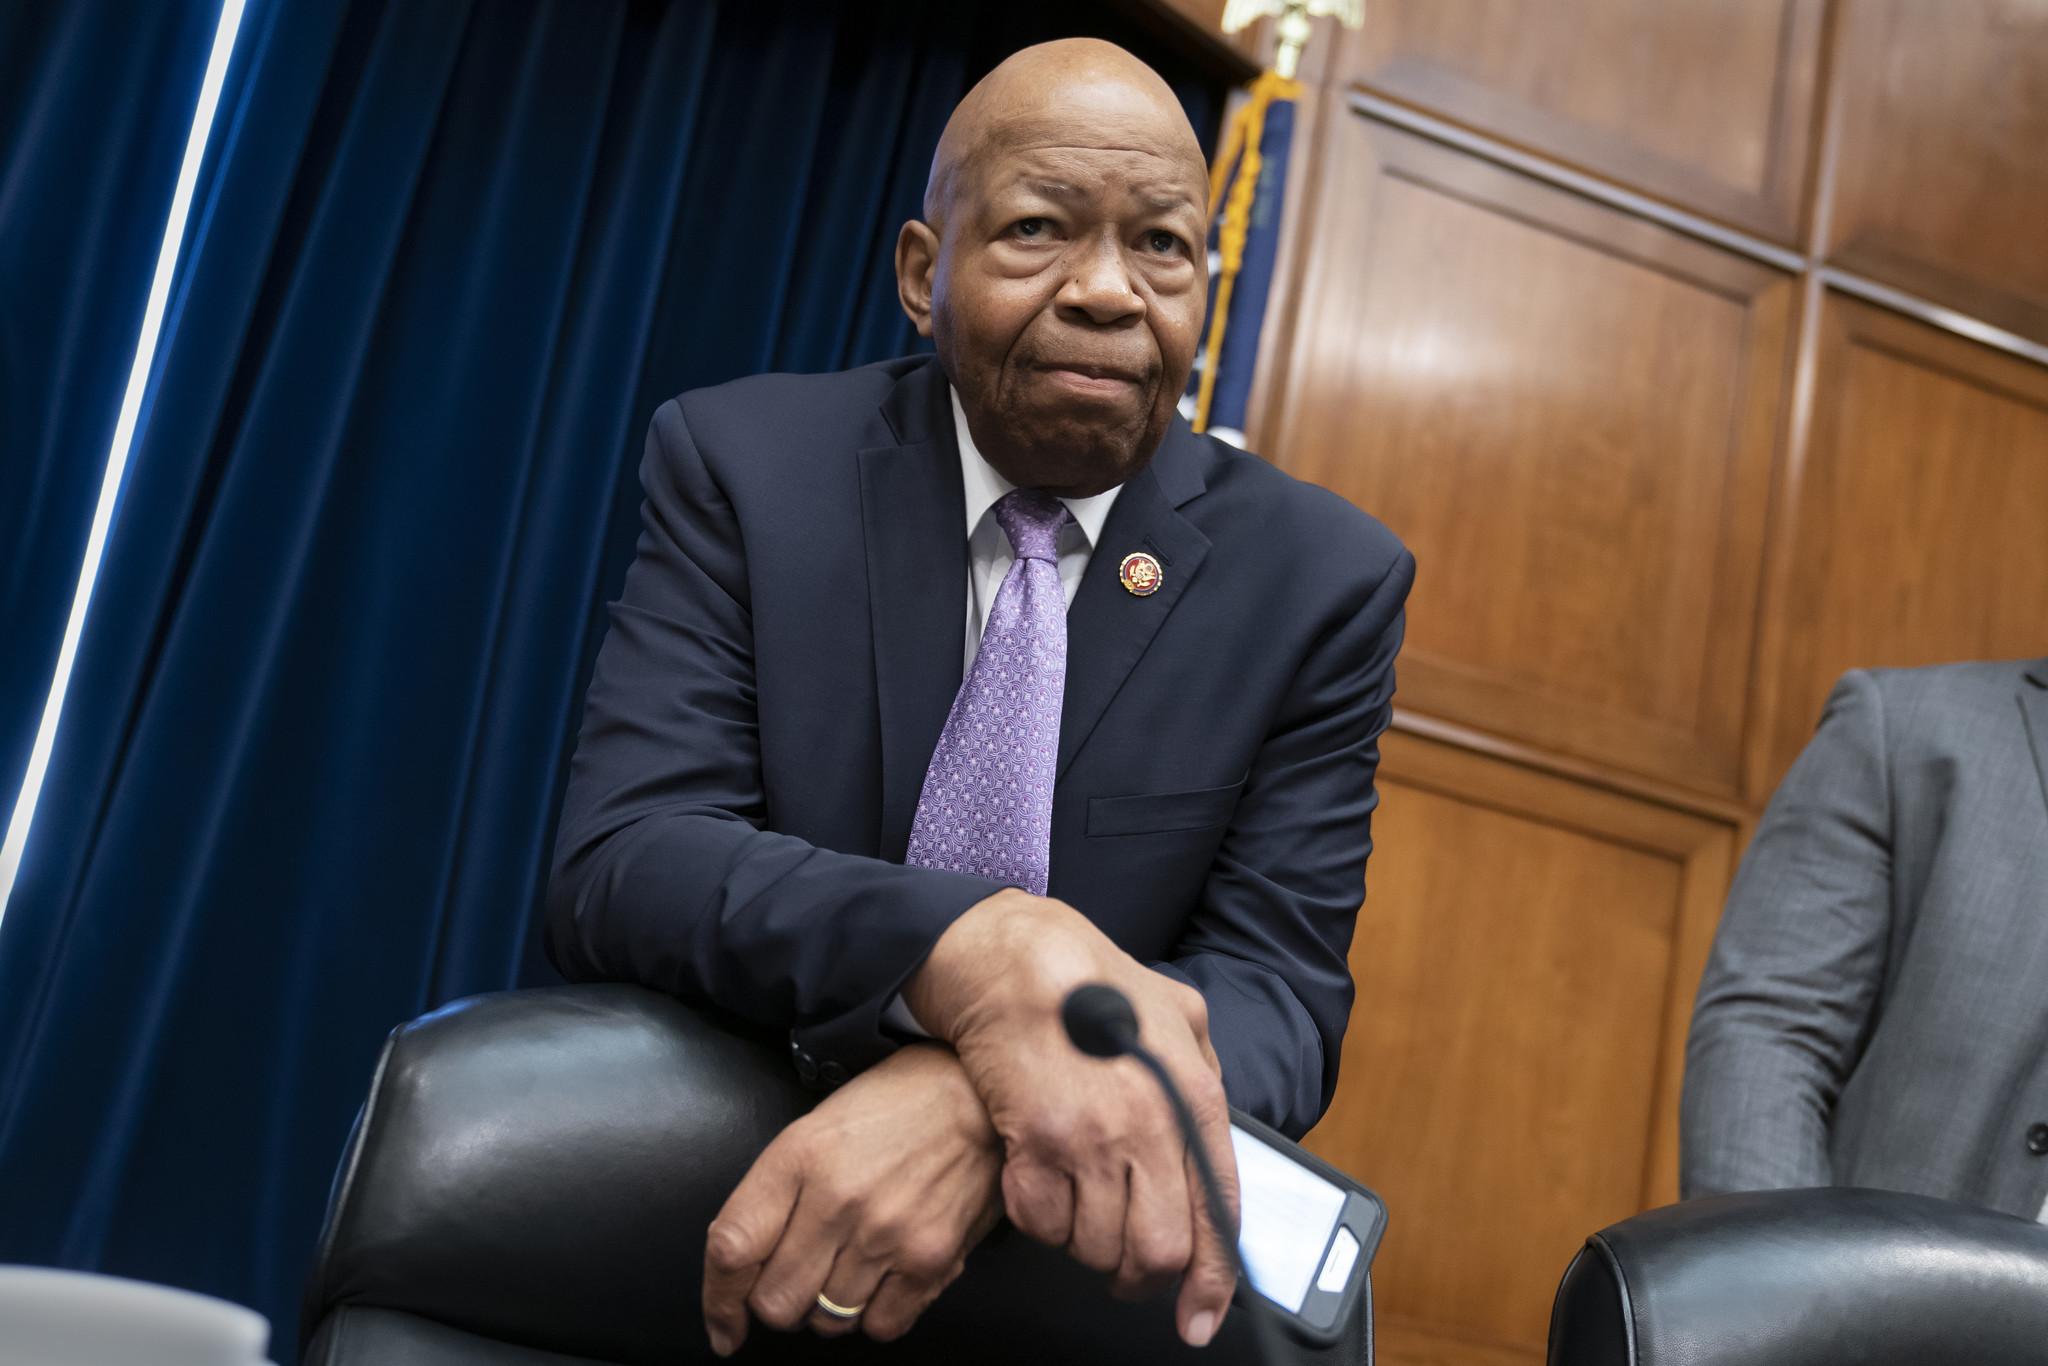 Trump, business organization sue Democratic House chairman to block subpoena that seeks financial records